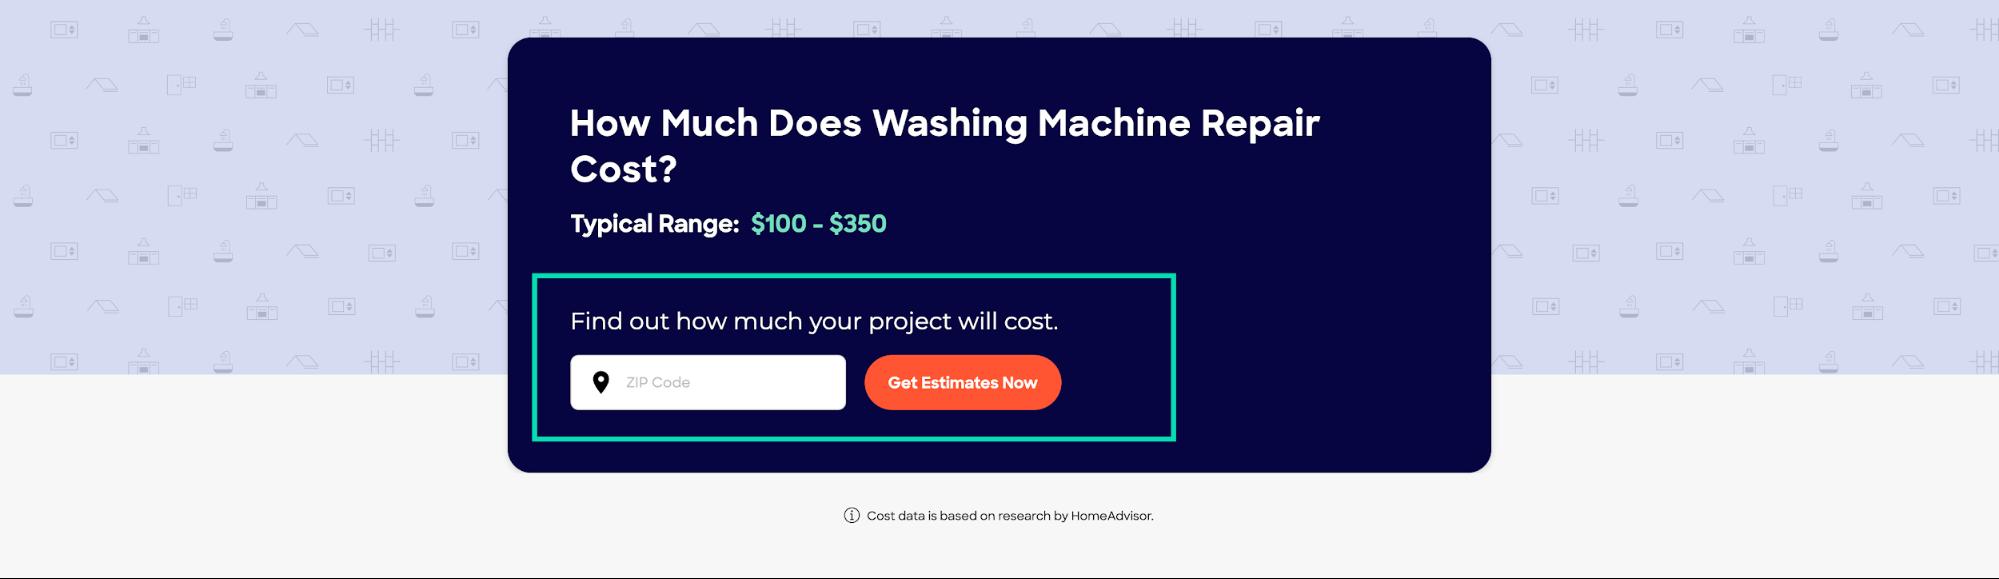 murray dare competitor analysis example washing machine repair company comparison 13